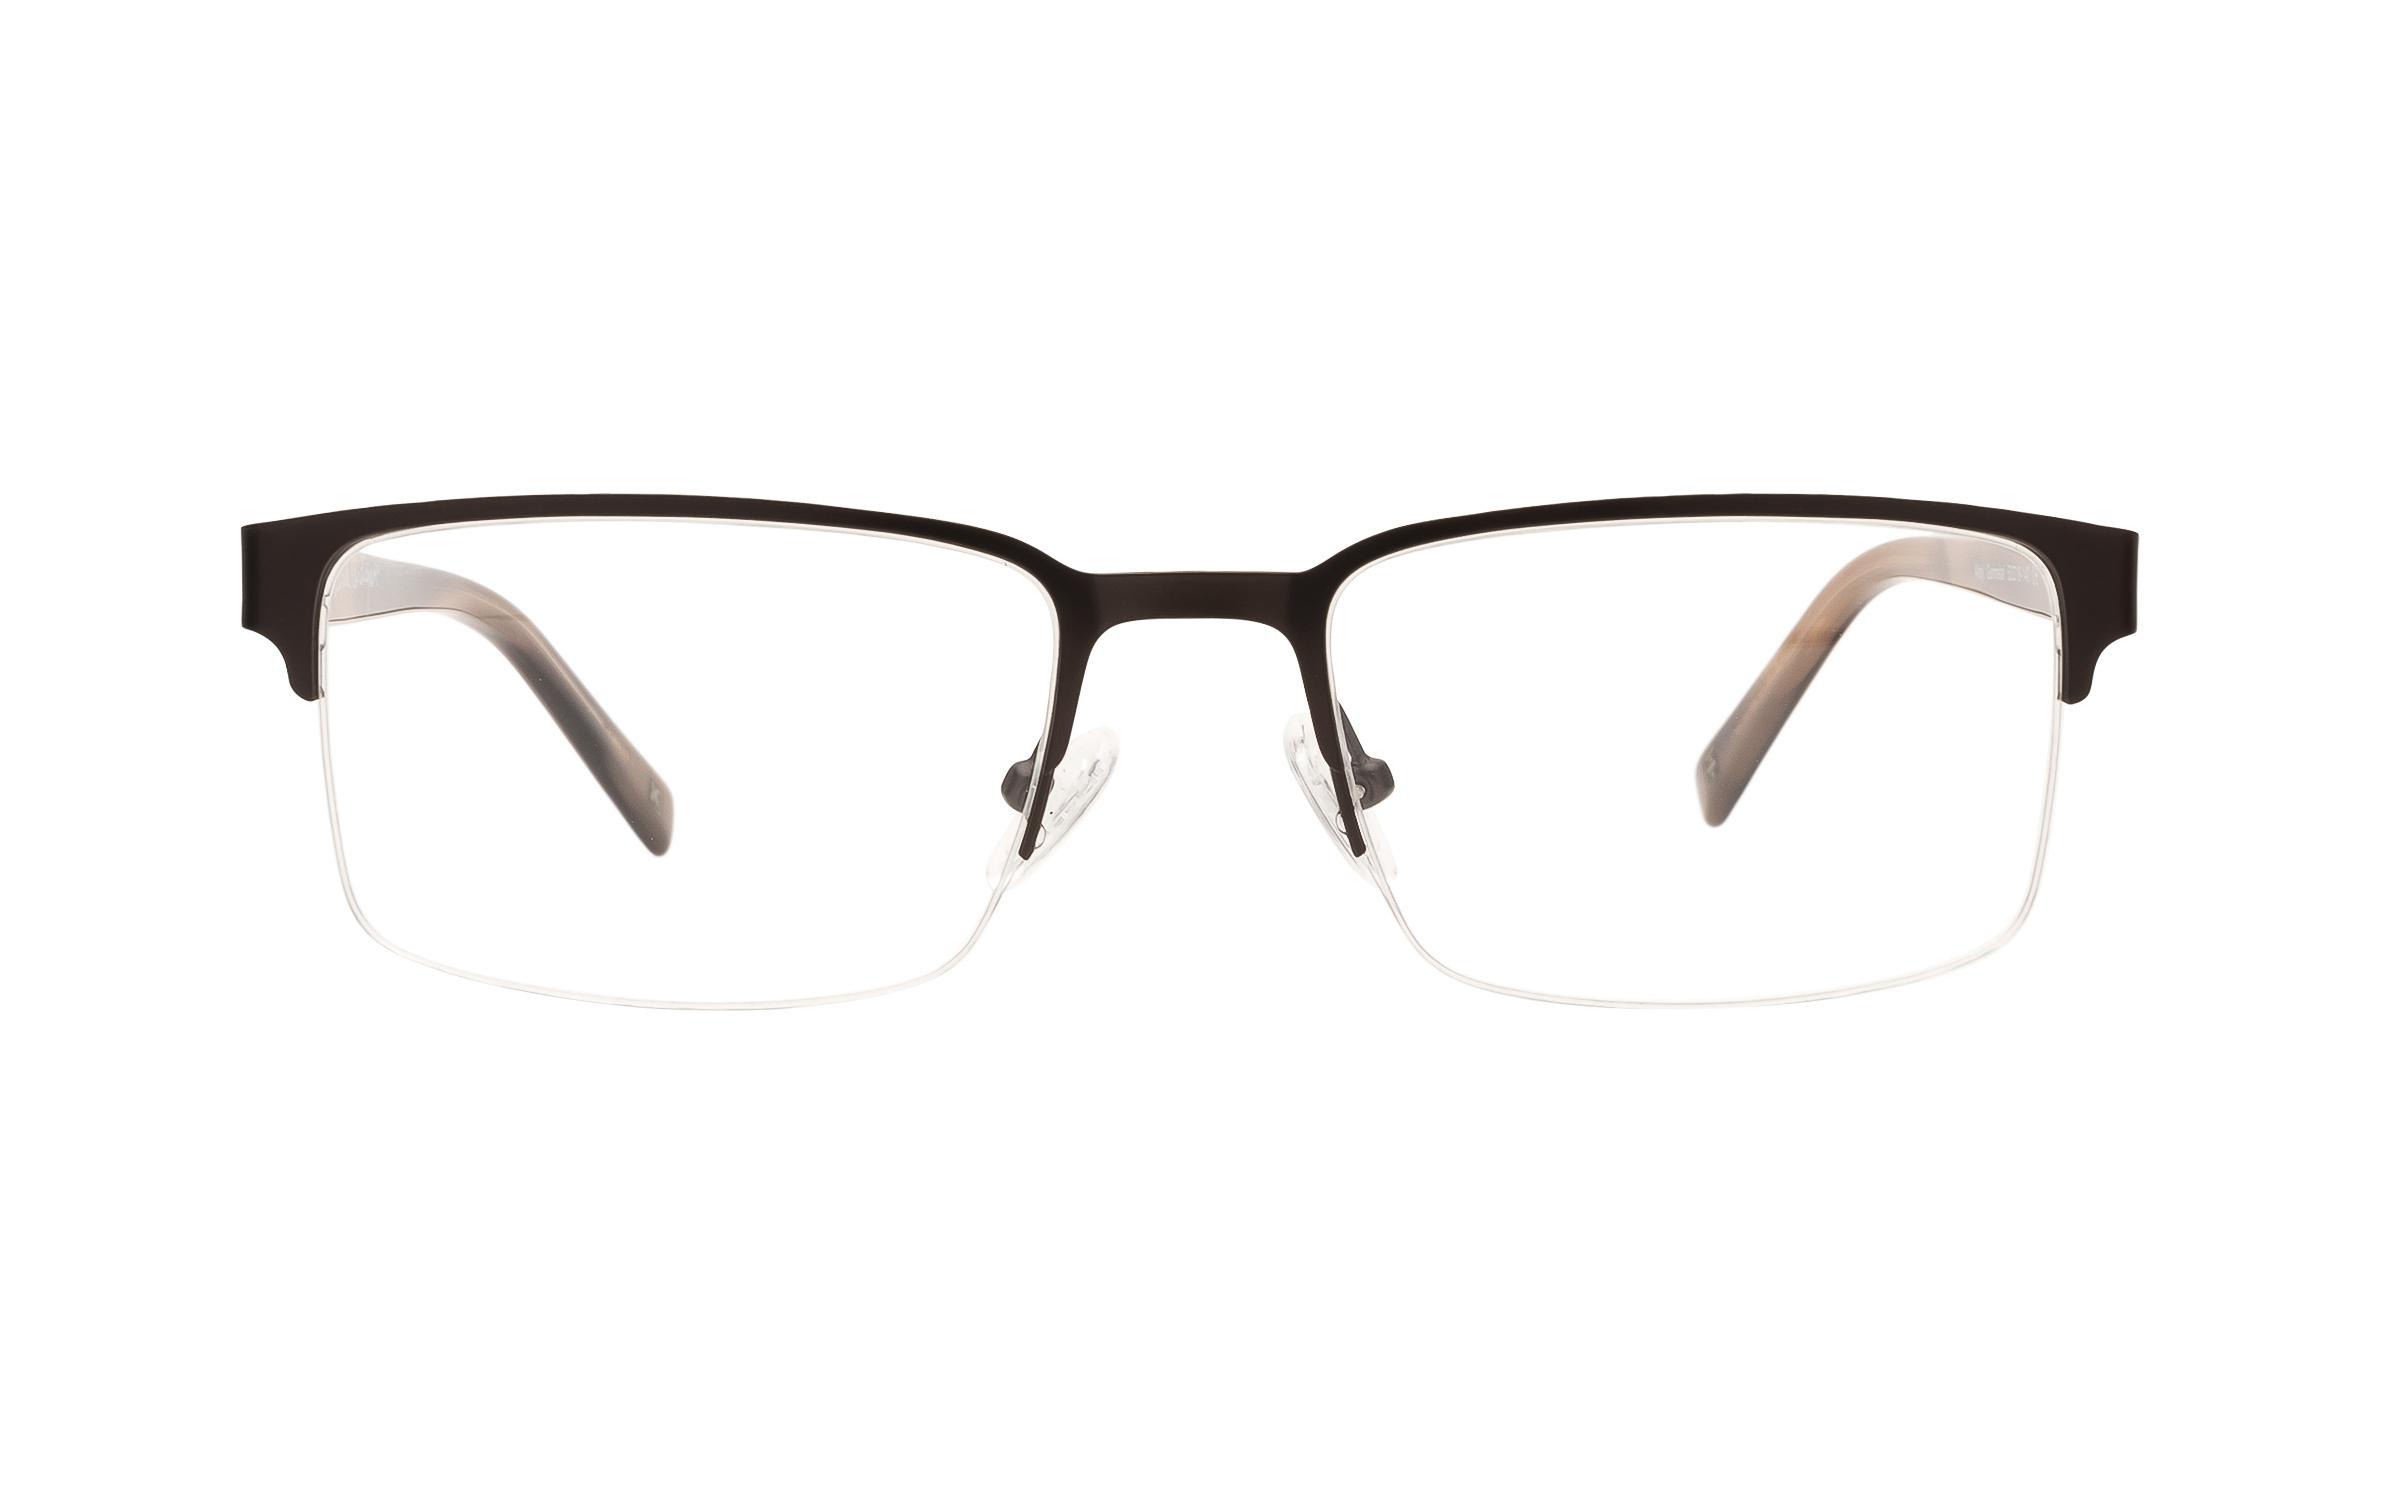 Derek_Cardigan_Mens_Glasses_Semi_Rimless_GreyBrown_Online_Coastal